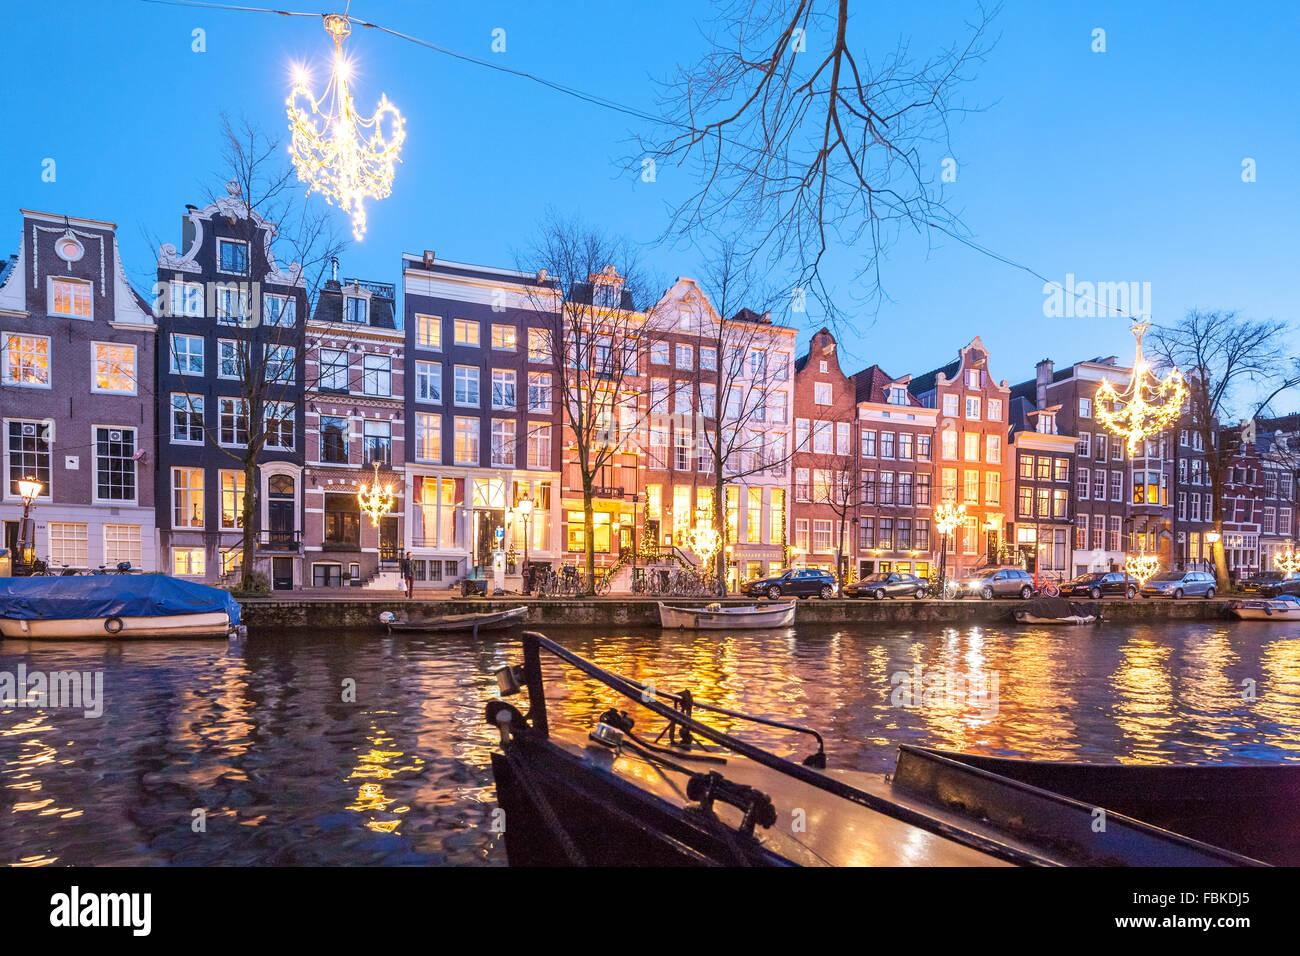 L'Ambassade Hotel in Amsterdam Herengracht Canal in inverno stagionali con le luci di Natale. Foto Stock